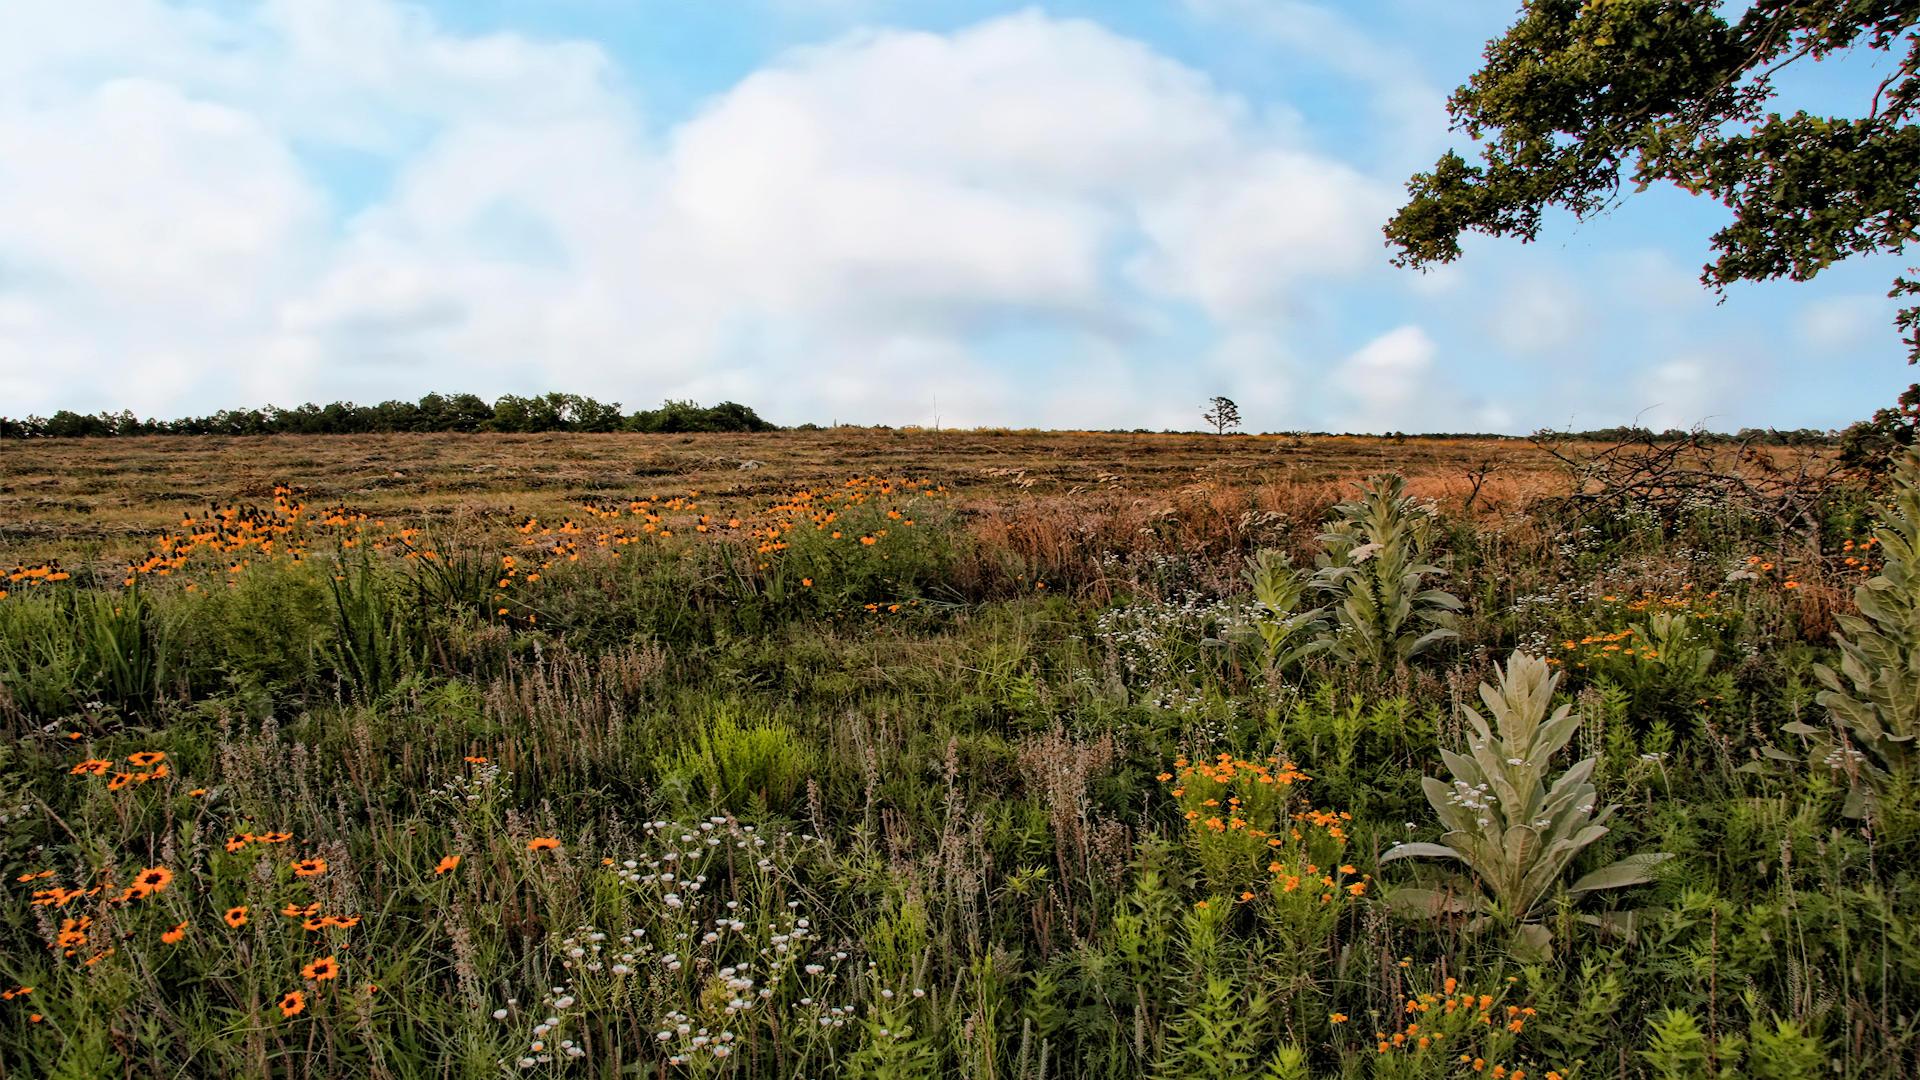 Field Flowers by Frankief